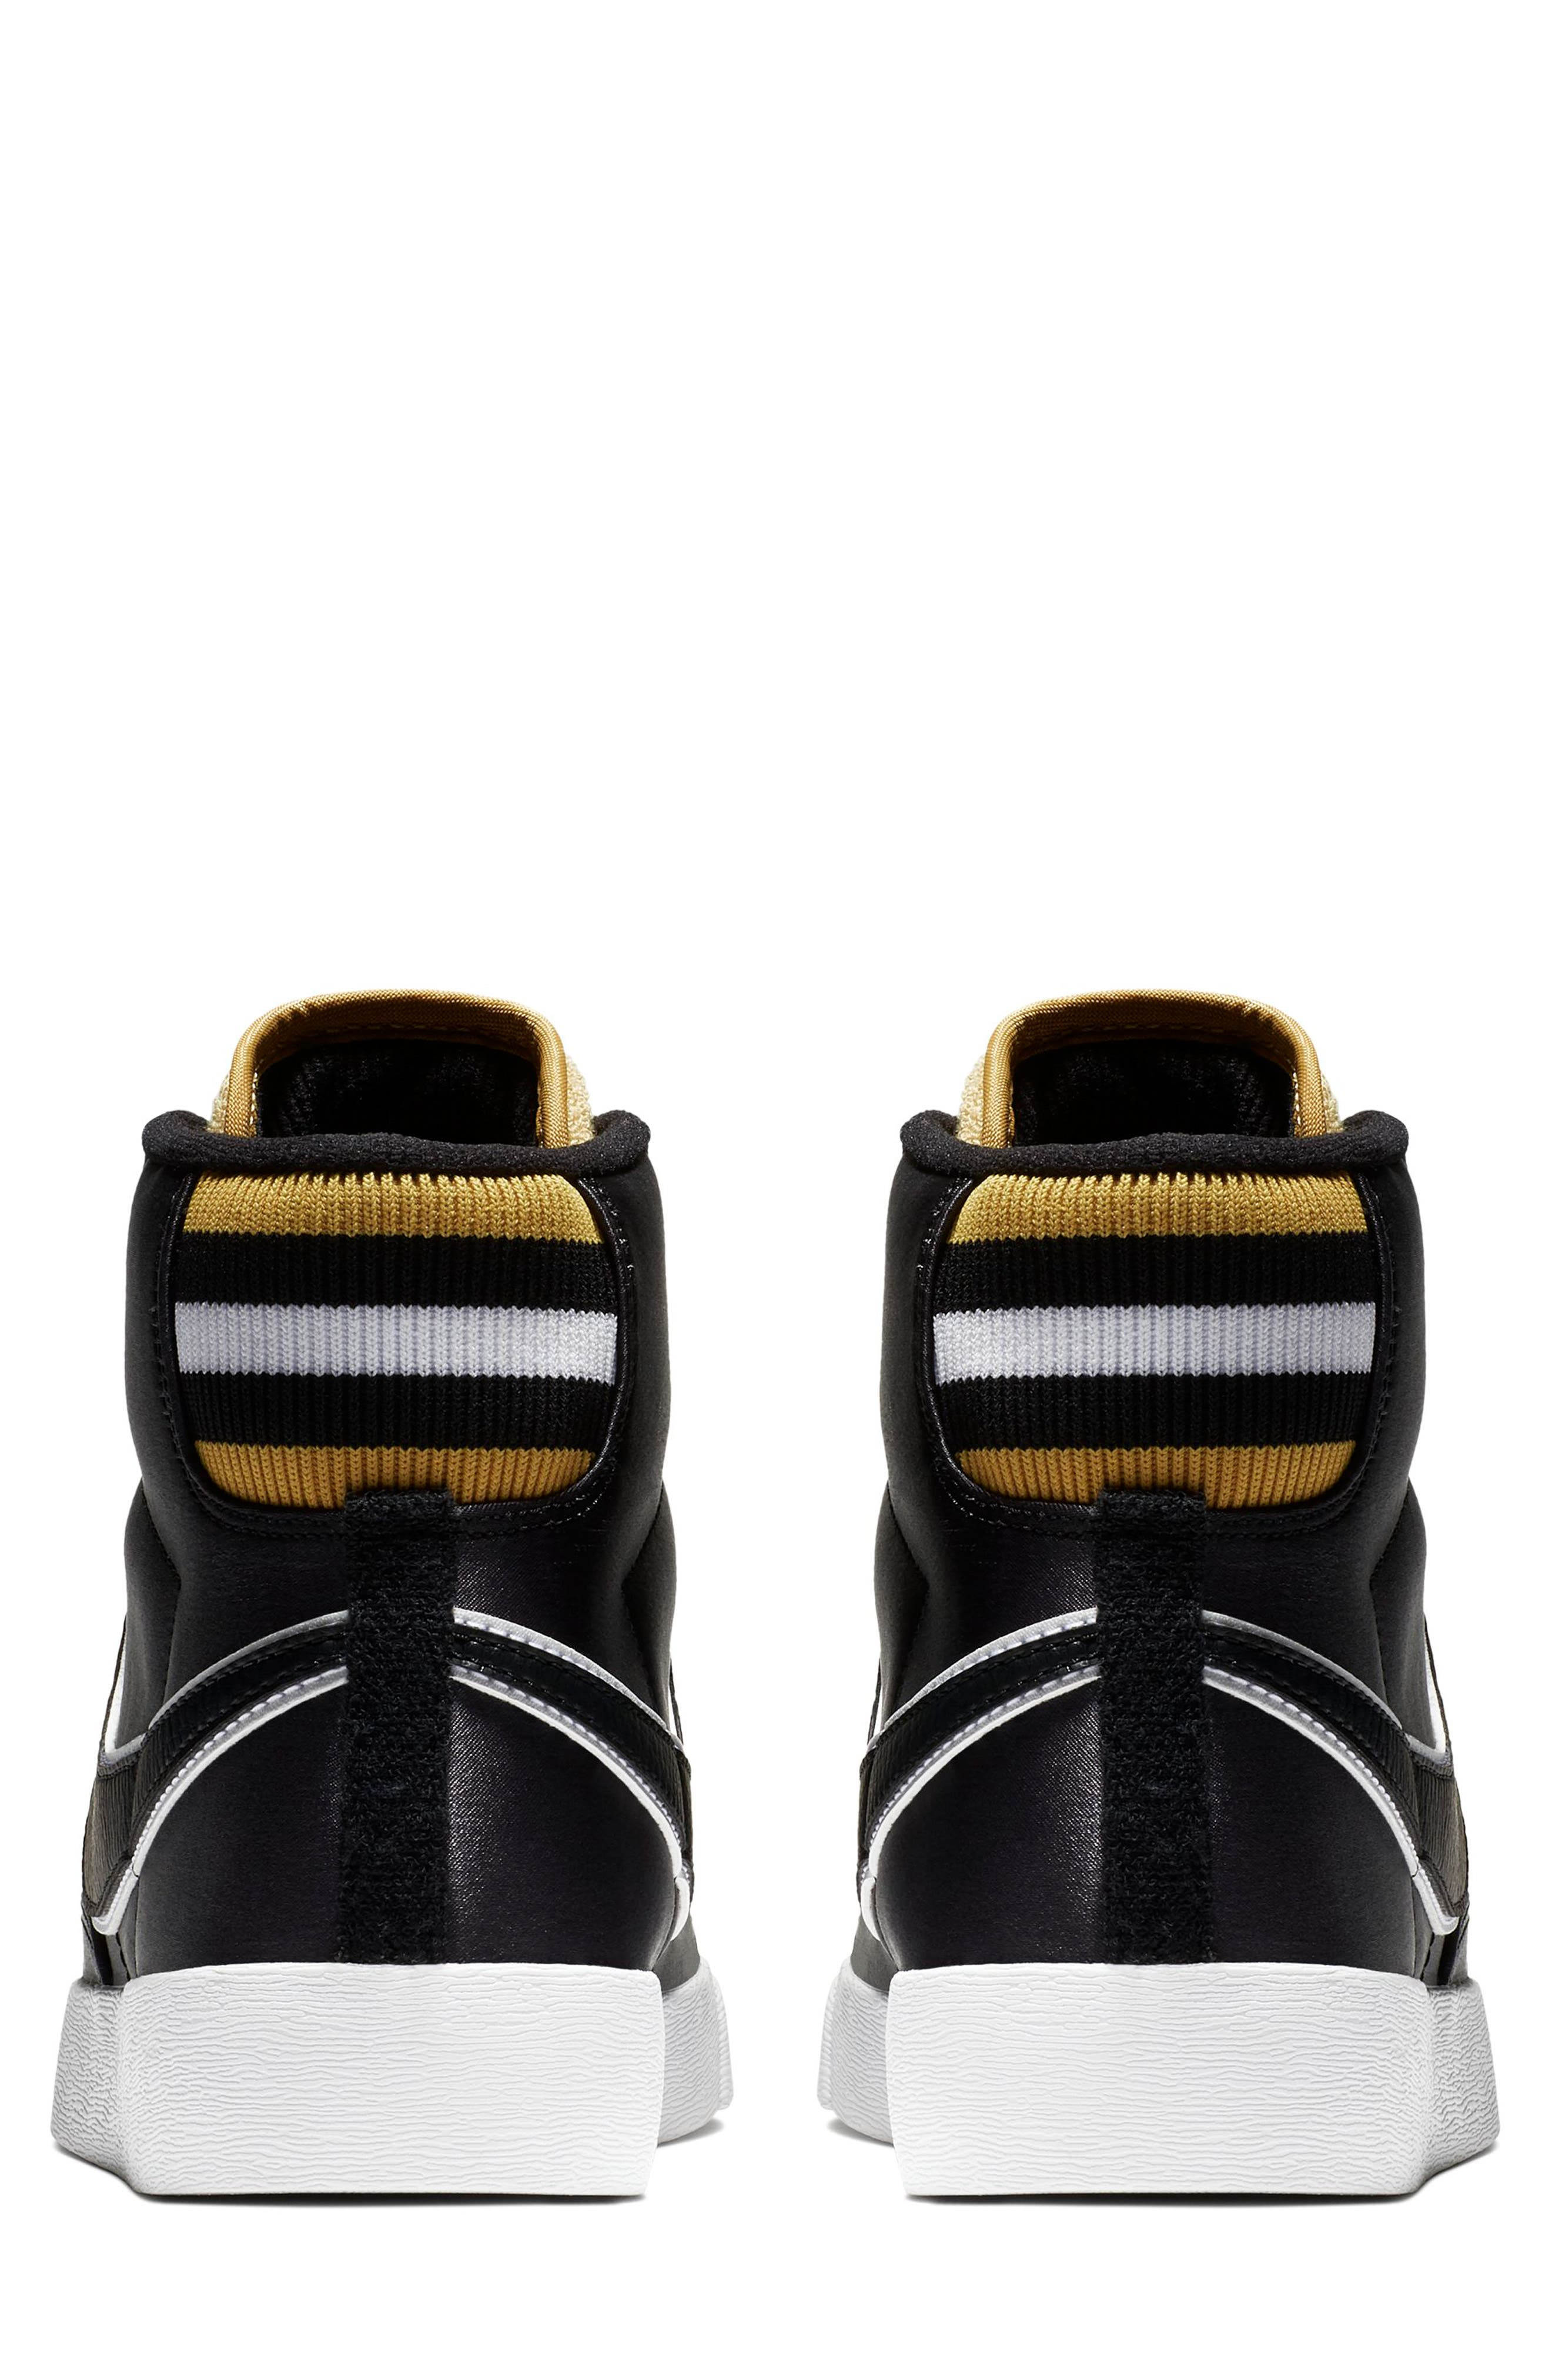 Blazer Mid Top Sneaker,                             Alternate thumbnail 2, color,                             BLACK/ BLACK